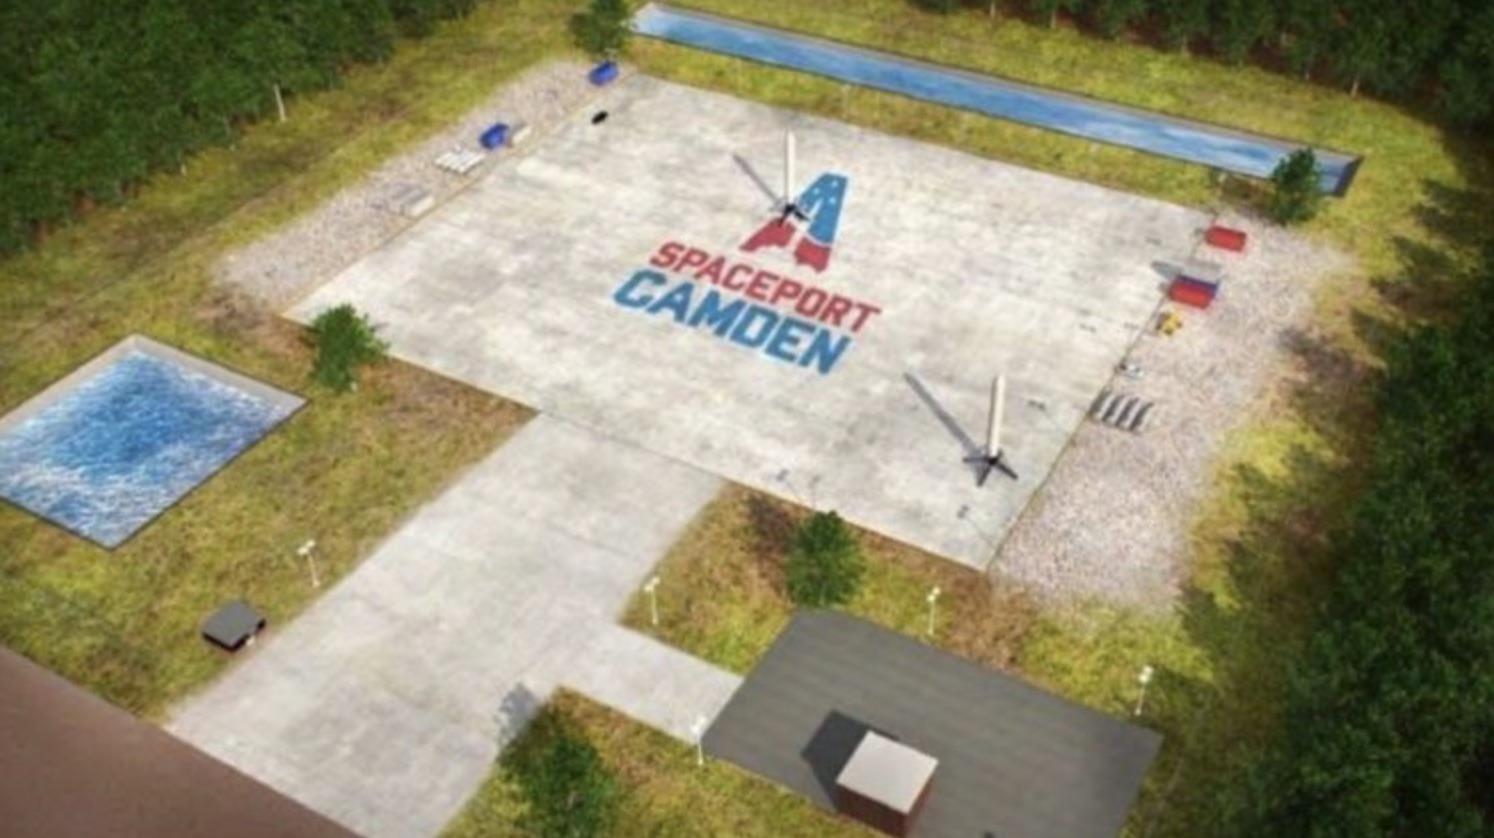 spaceport camden, aerial